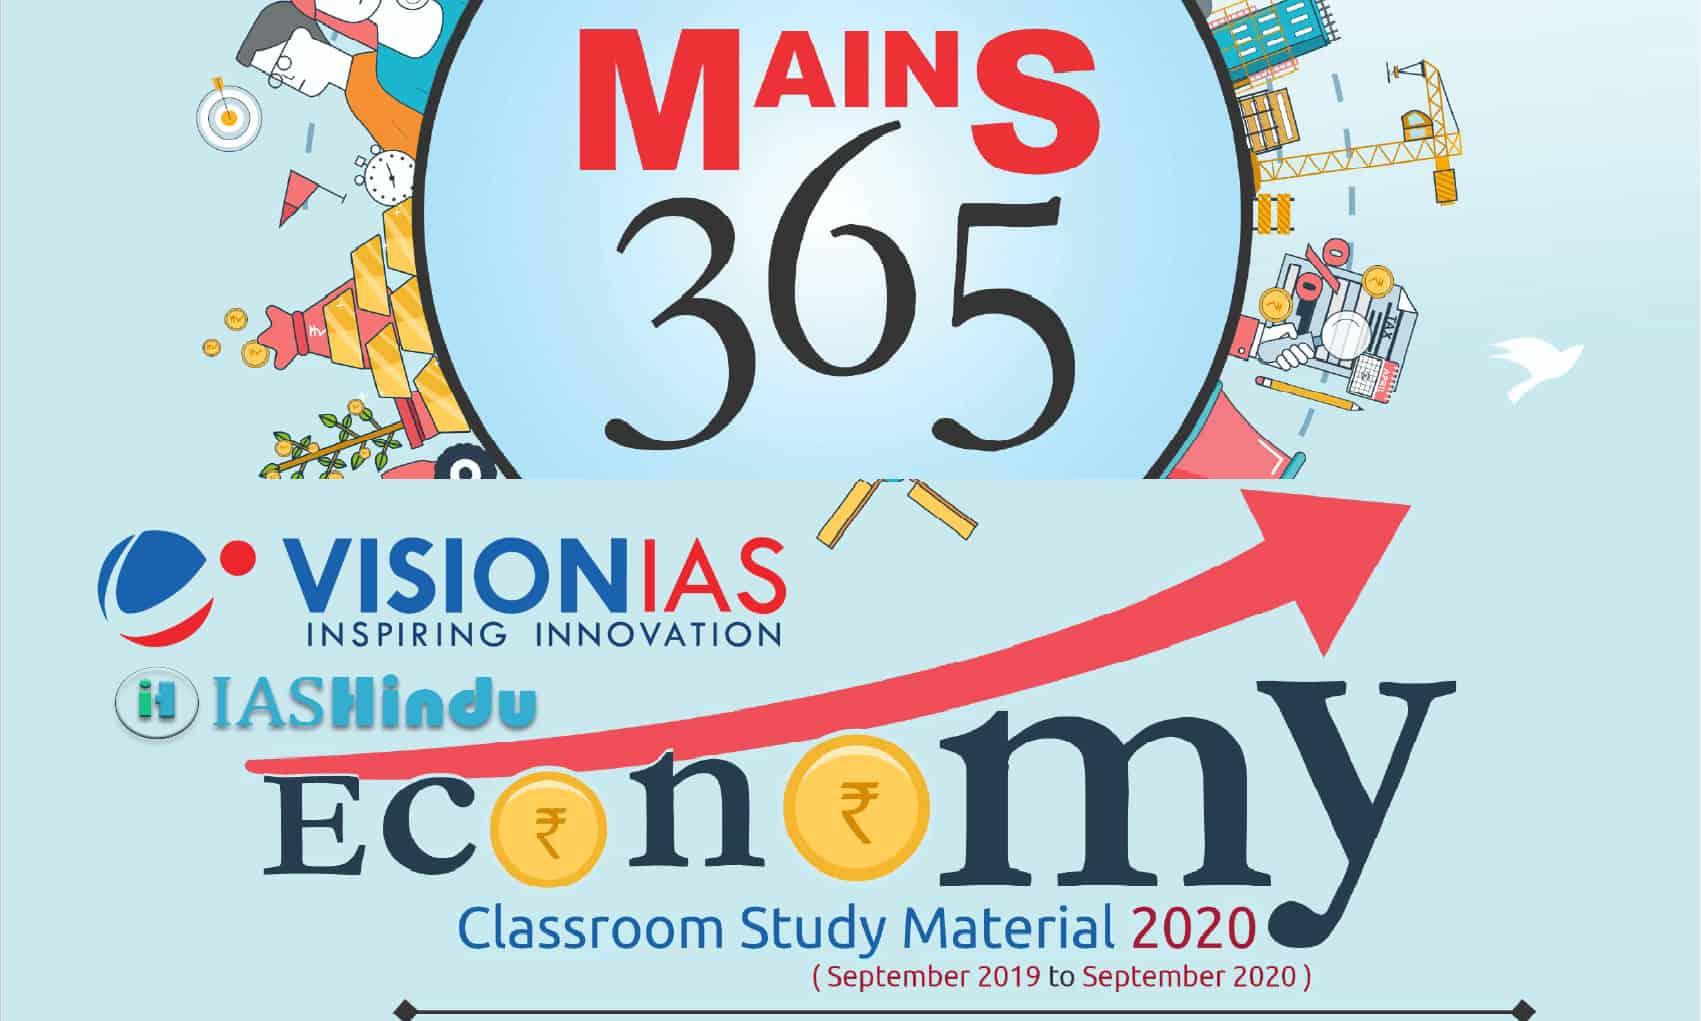 Vision IAS Mains 365 Economy 2020